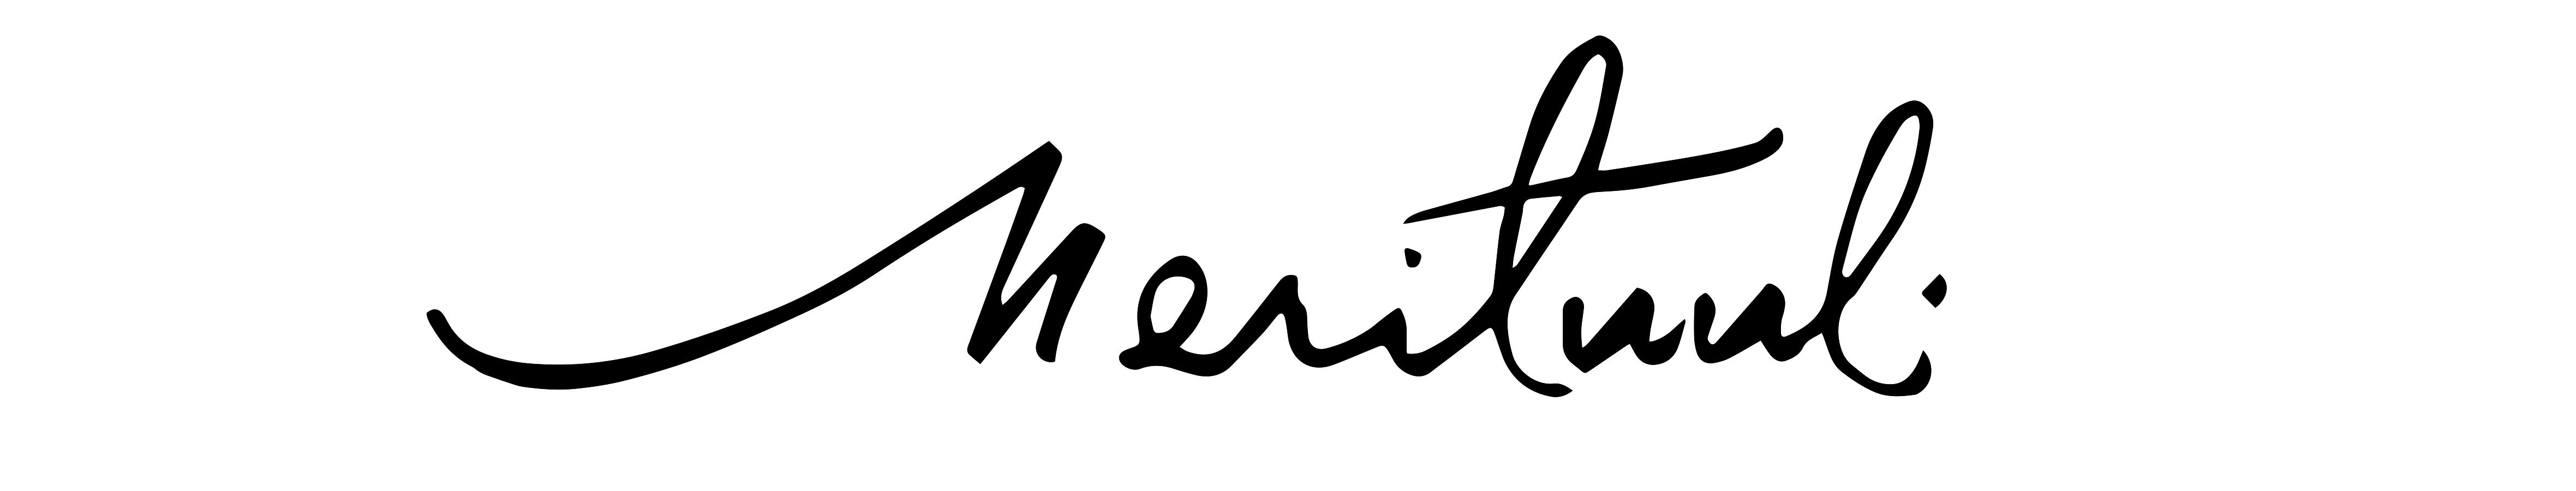 MeriTuuli